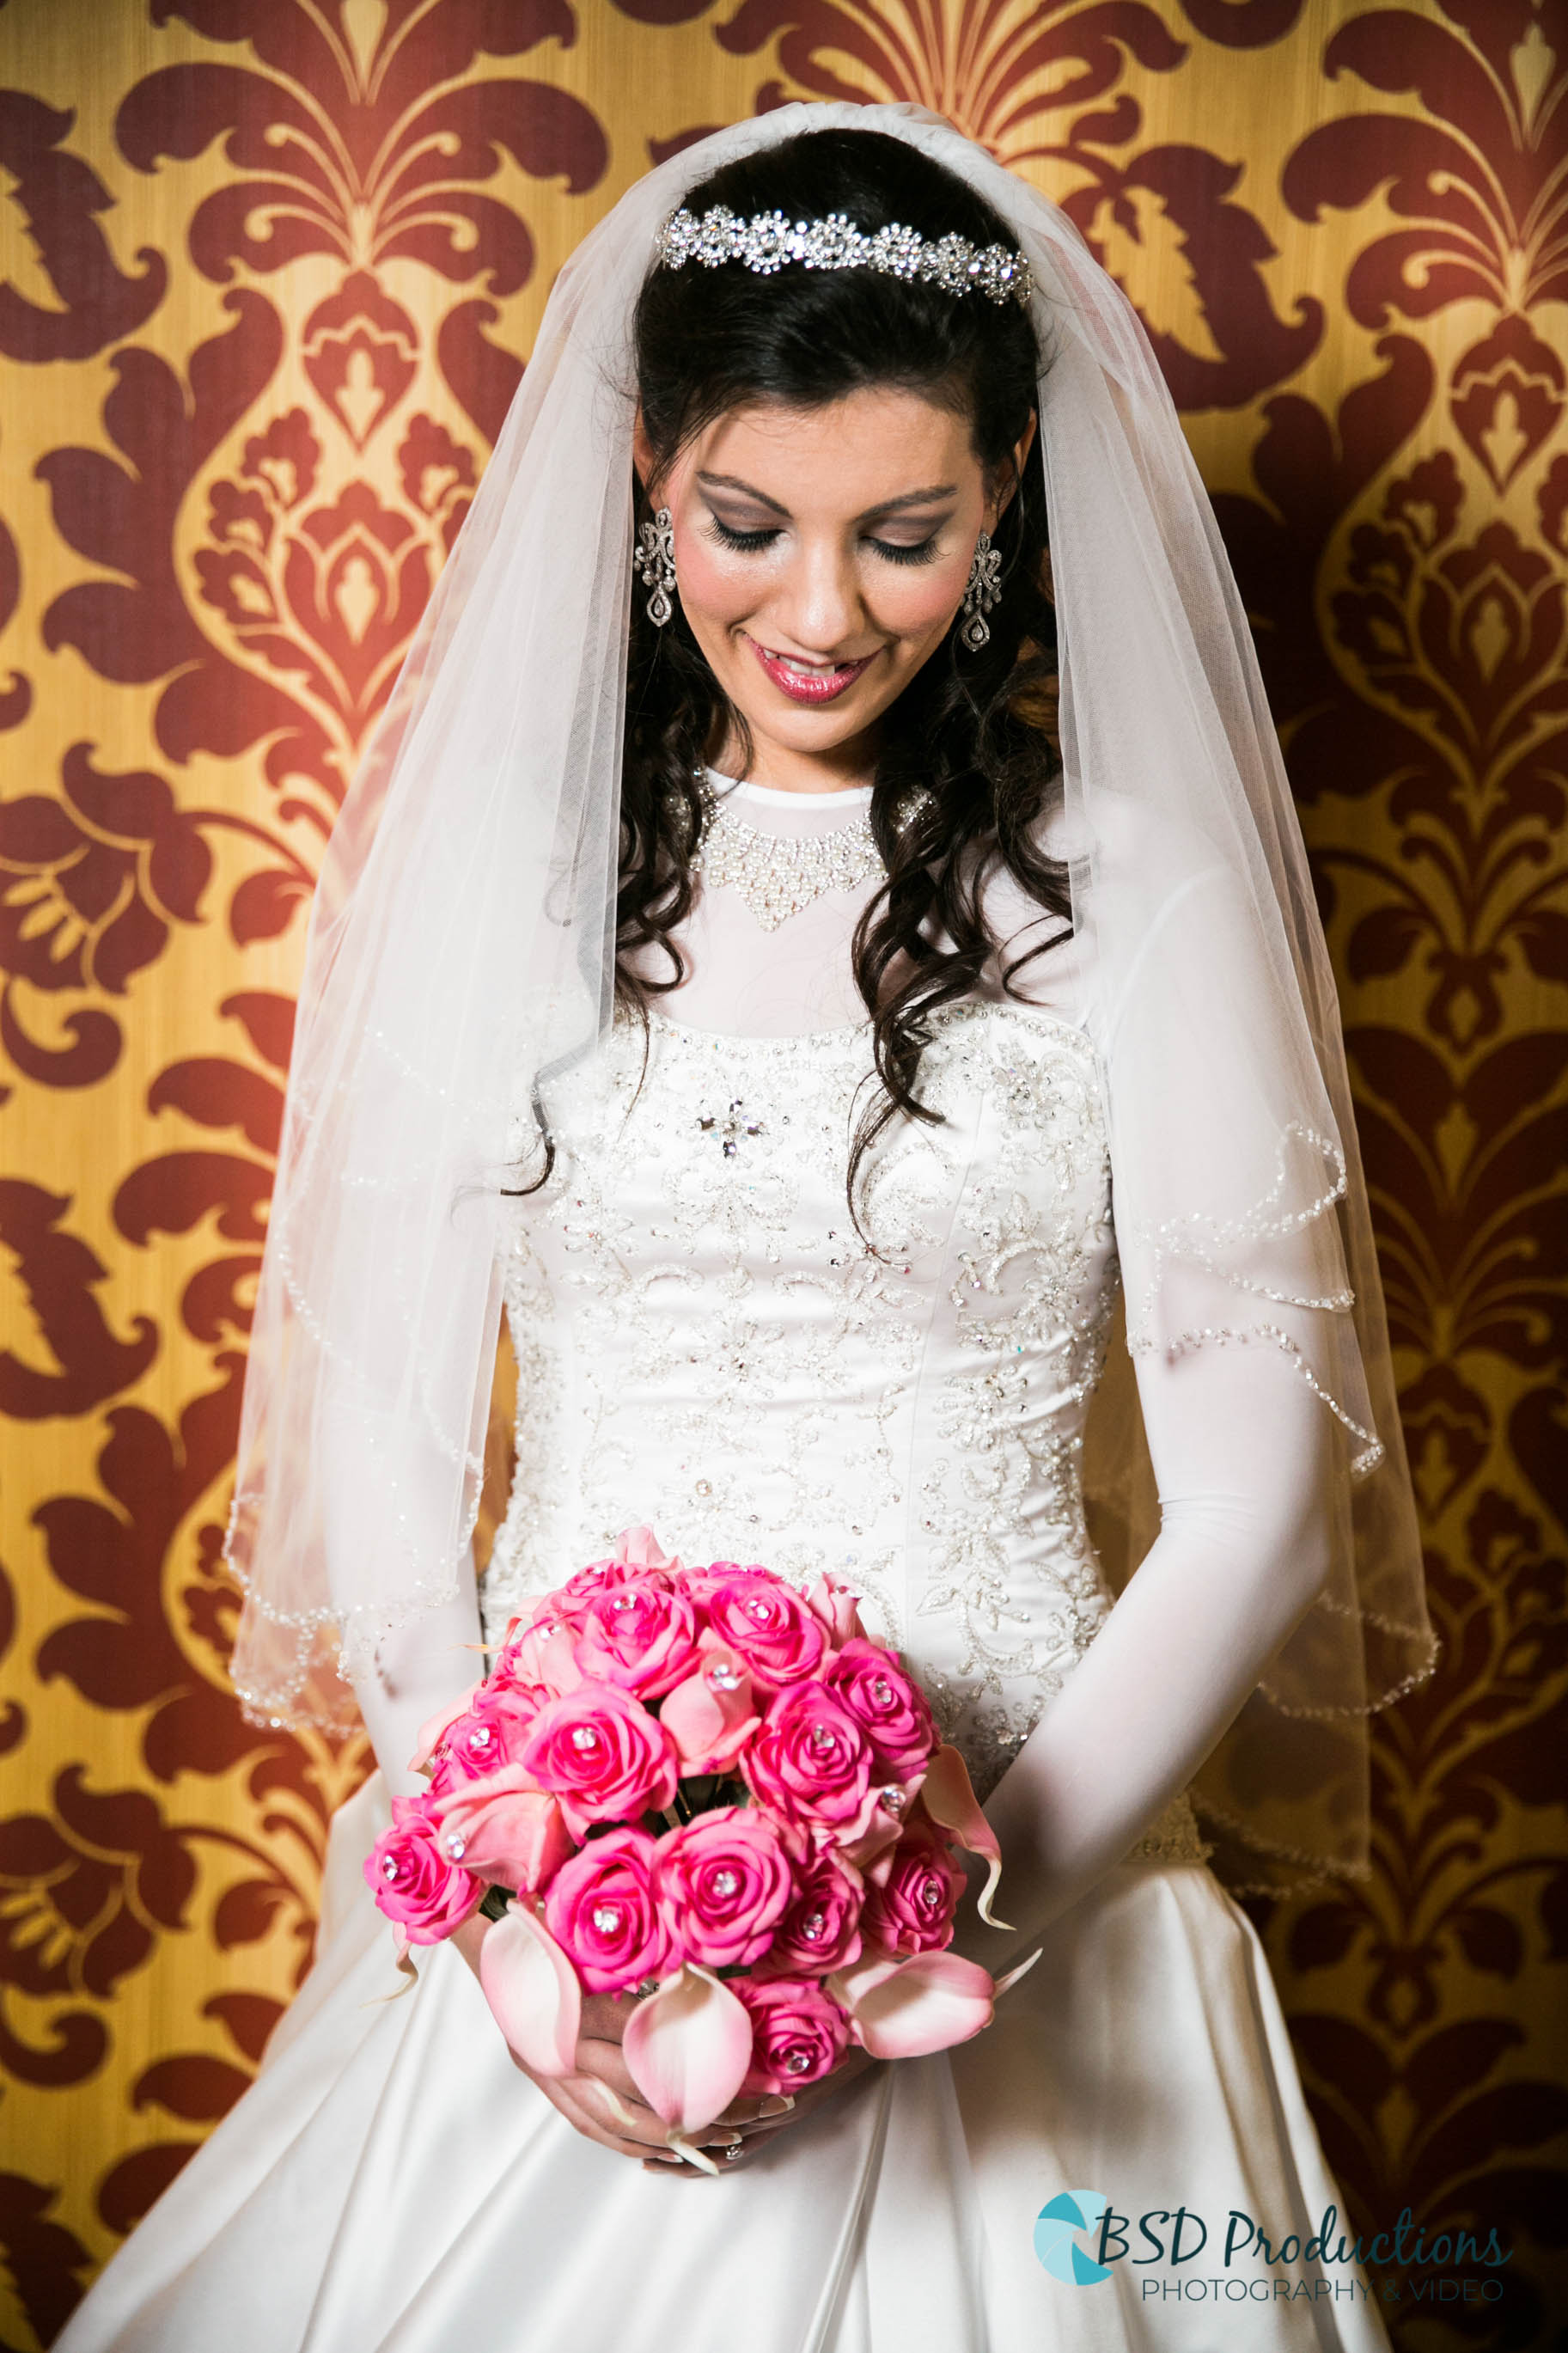 D_R_9817 Wedding – BSD Productions Photography